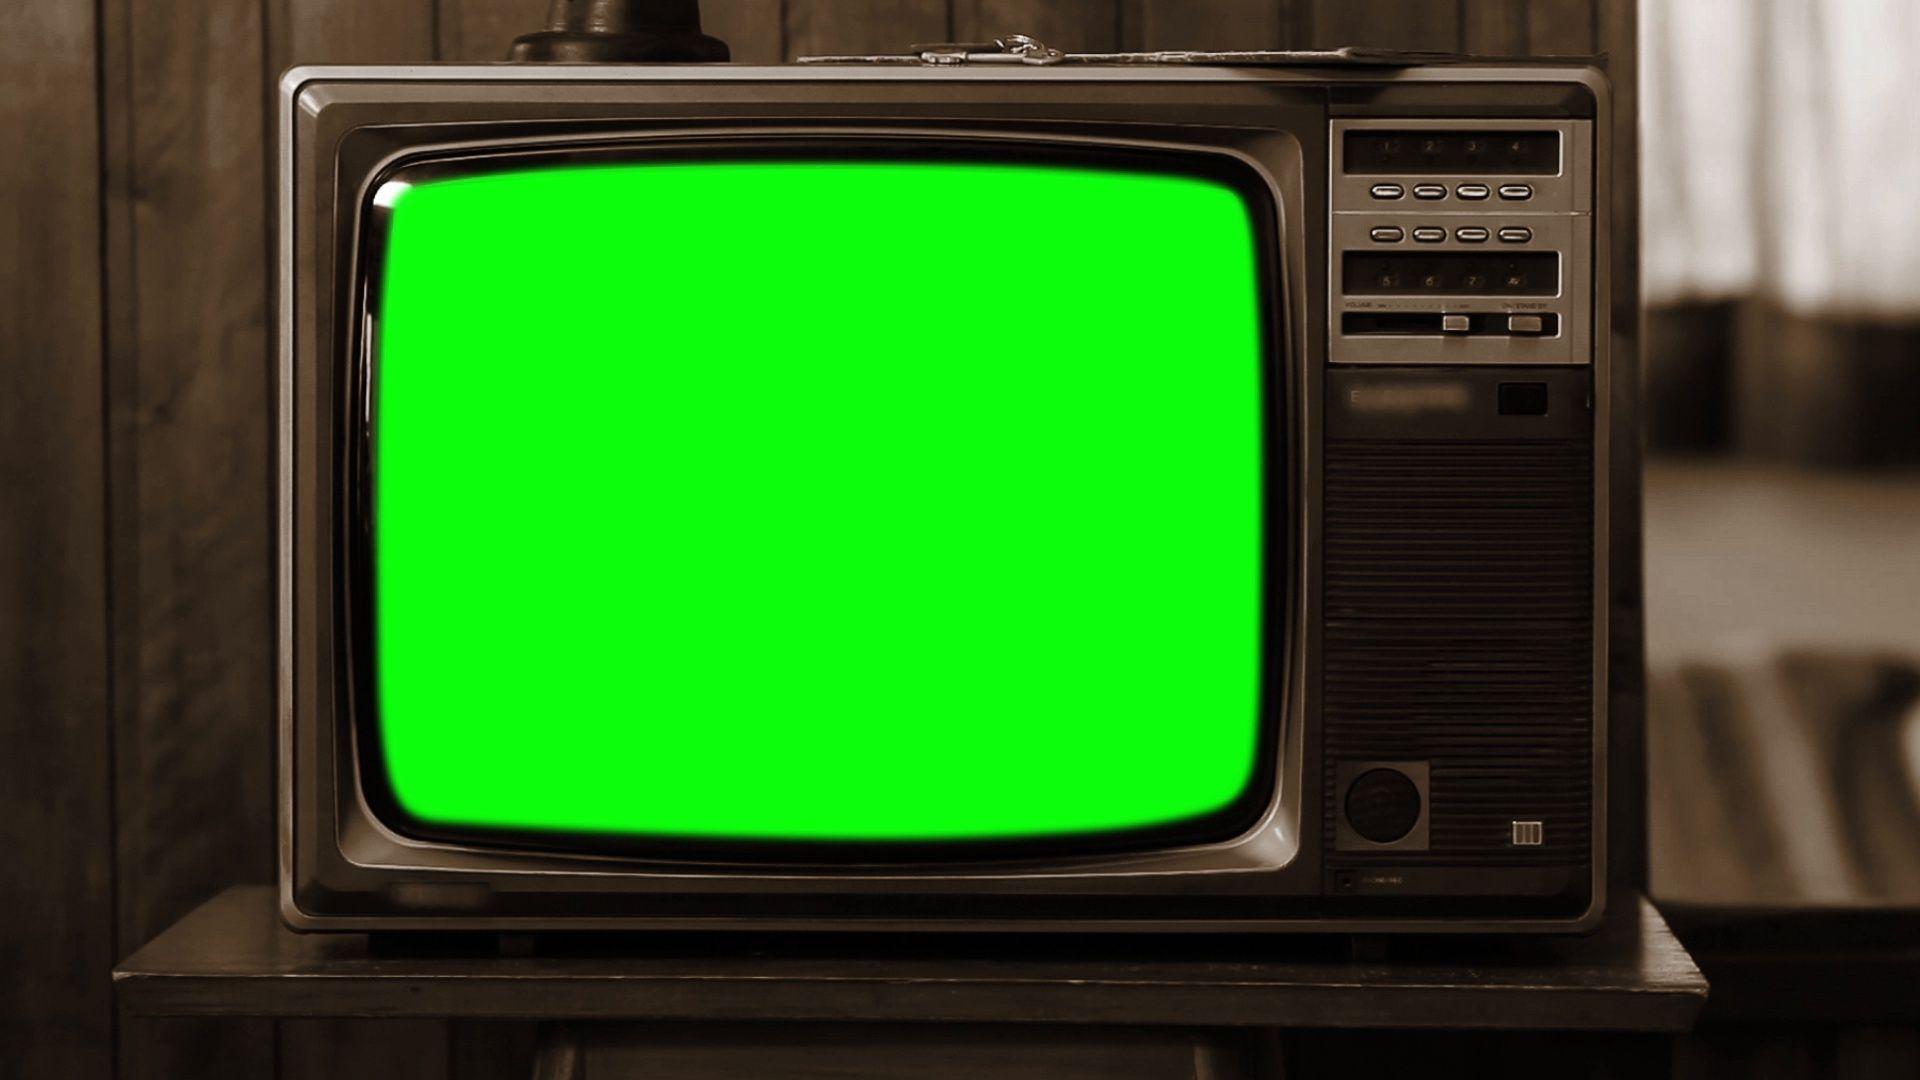 1980s Television Green Screen Sepia Tone Zoom Out Stock Footage Green Screen Television Sepia Greenscreen Retro Videos Chroma Key